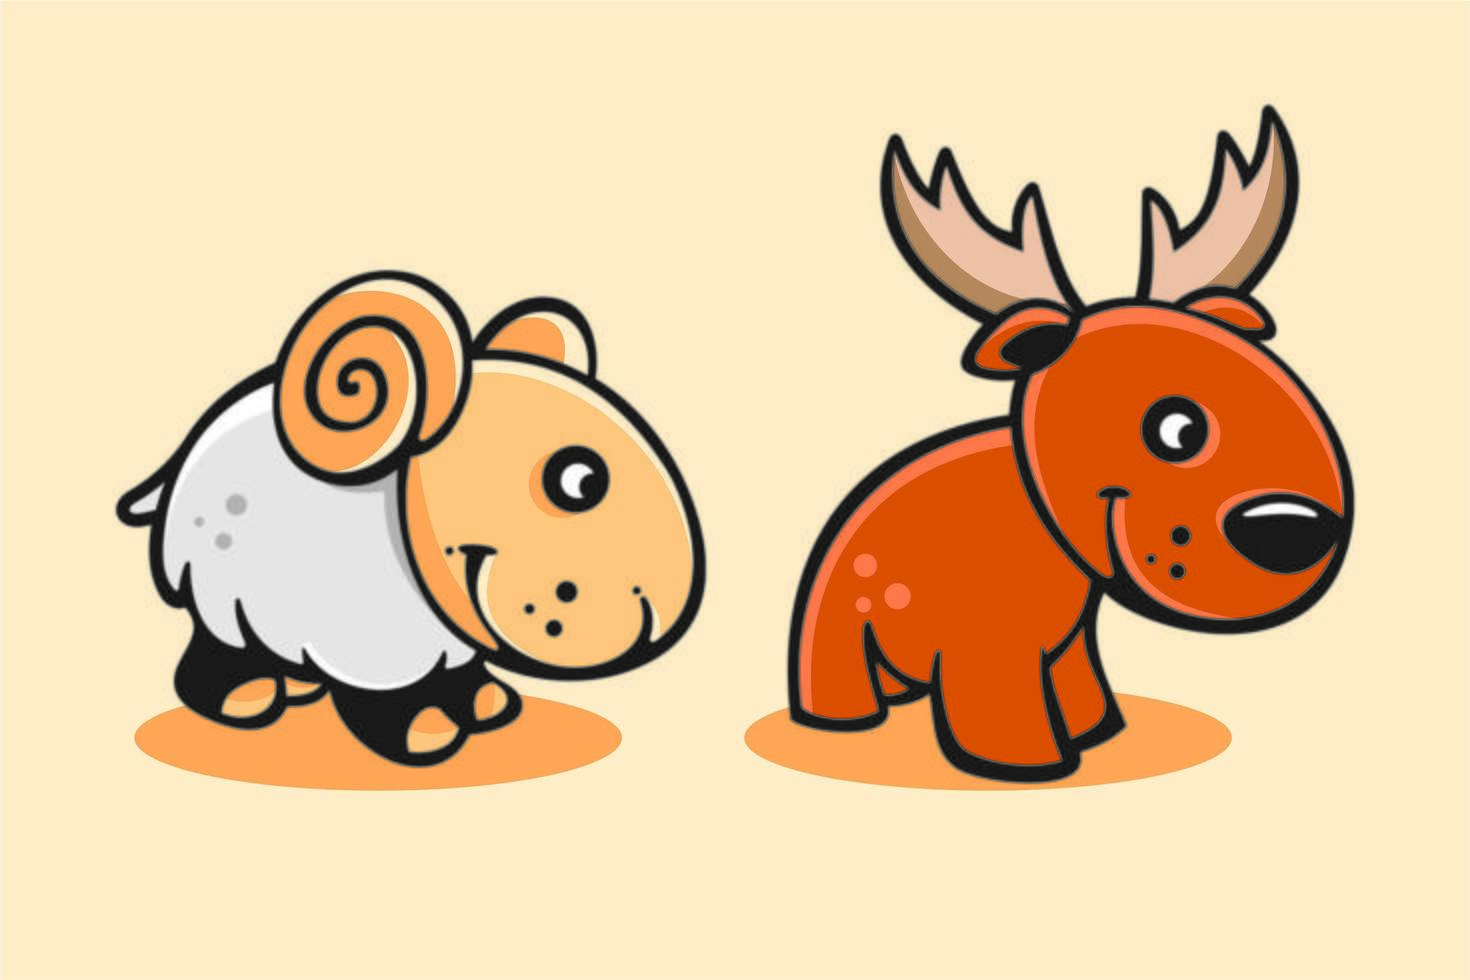 conjunto de bonito desenho animado bebê cabra e veado vetor